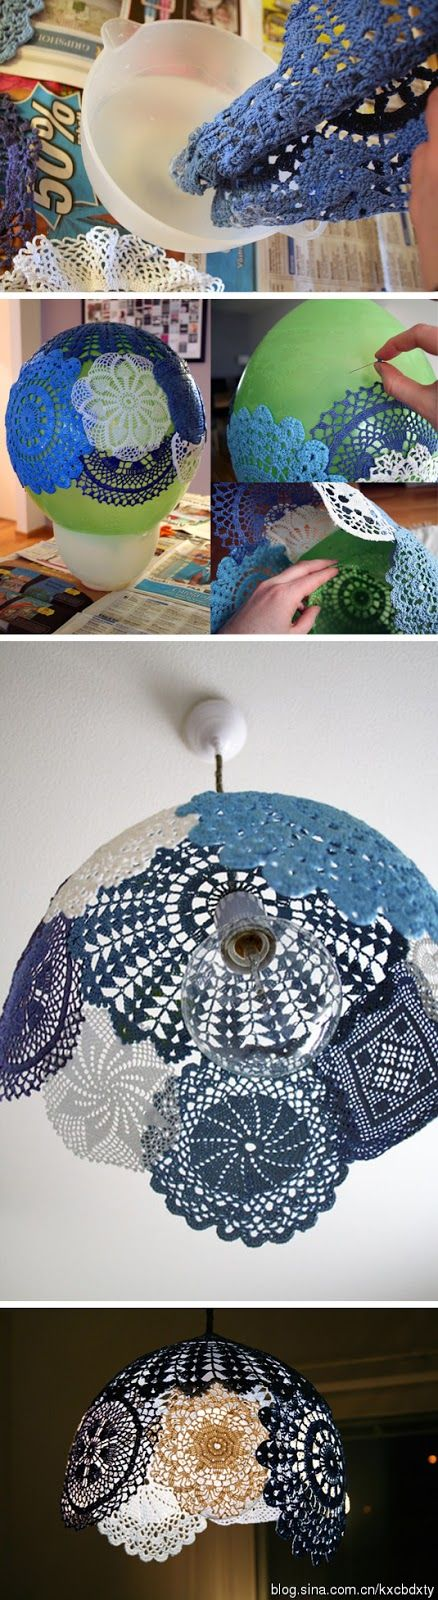 lampara cover tejido: